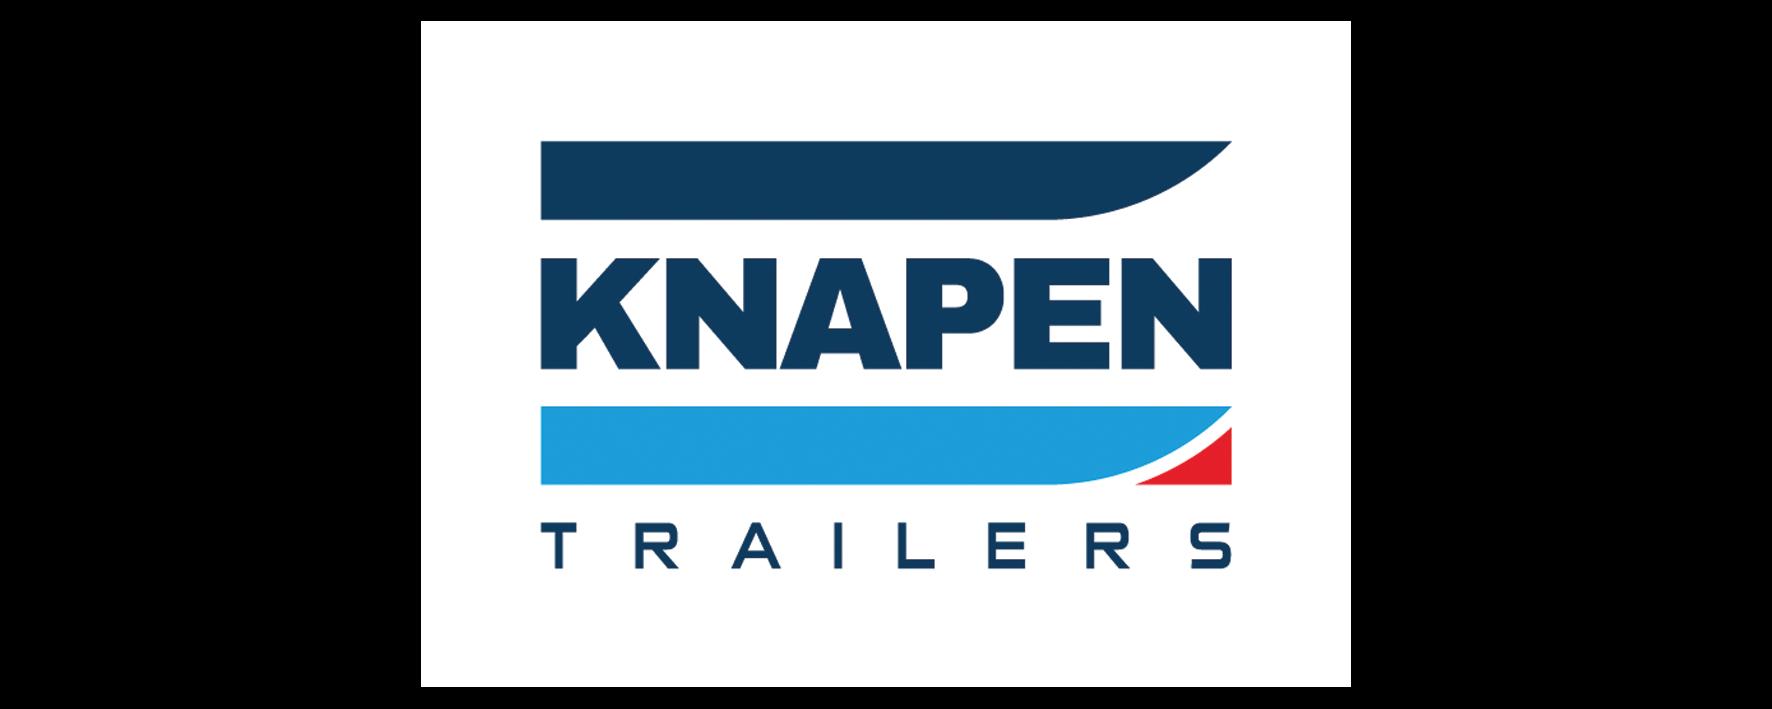 Knapen-logo-neg